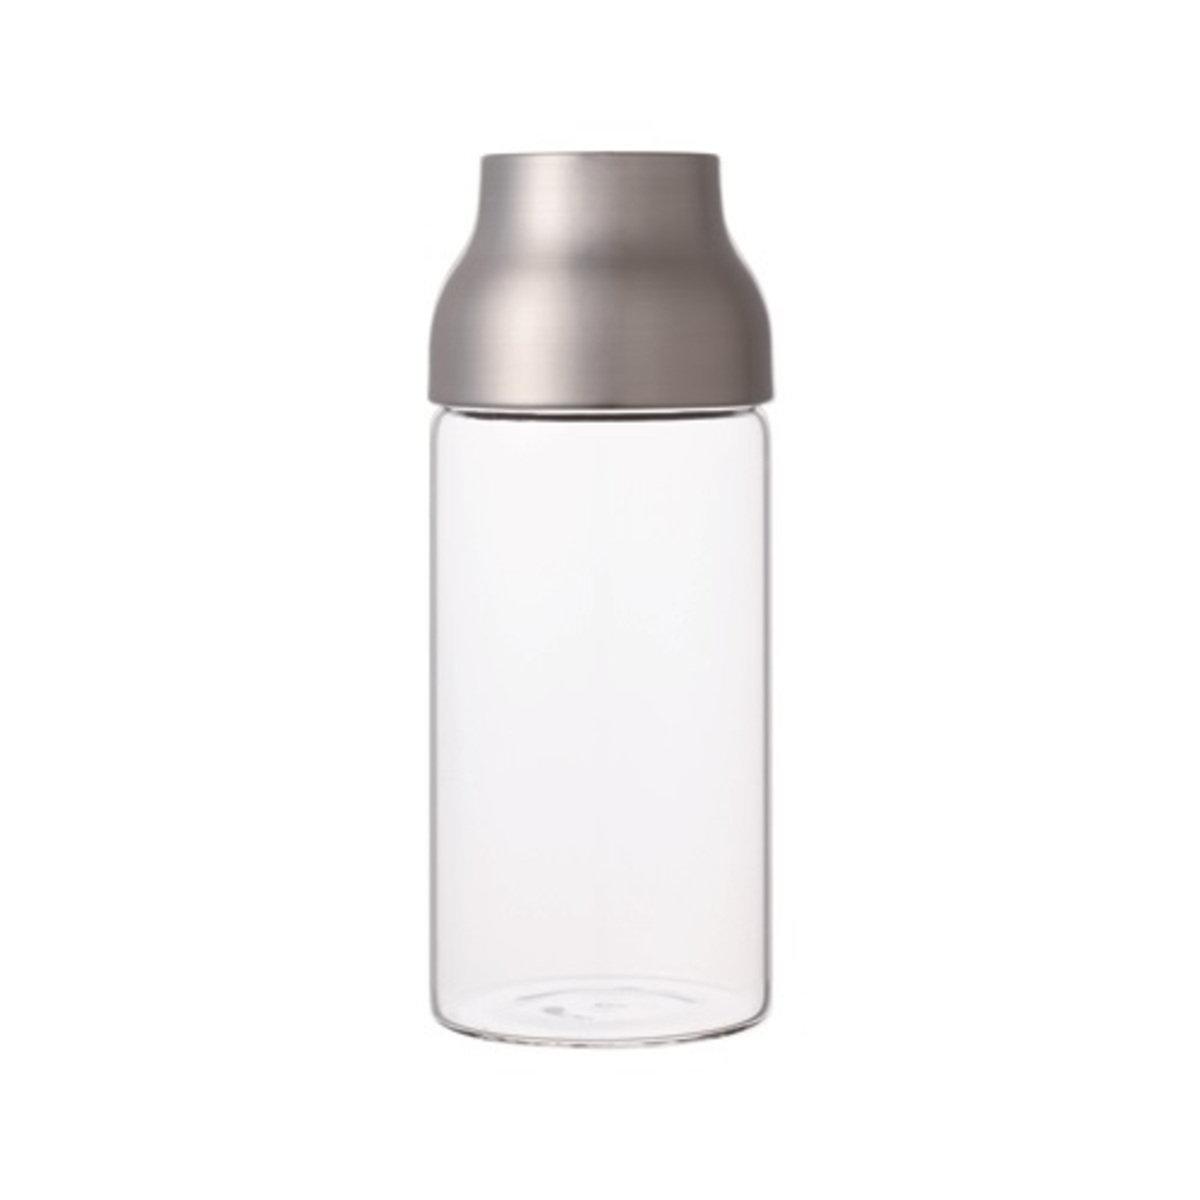 CAPSULE 玻璃水瓶 不鏽鋼蓋